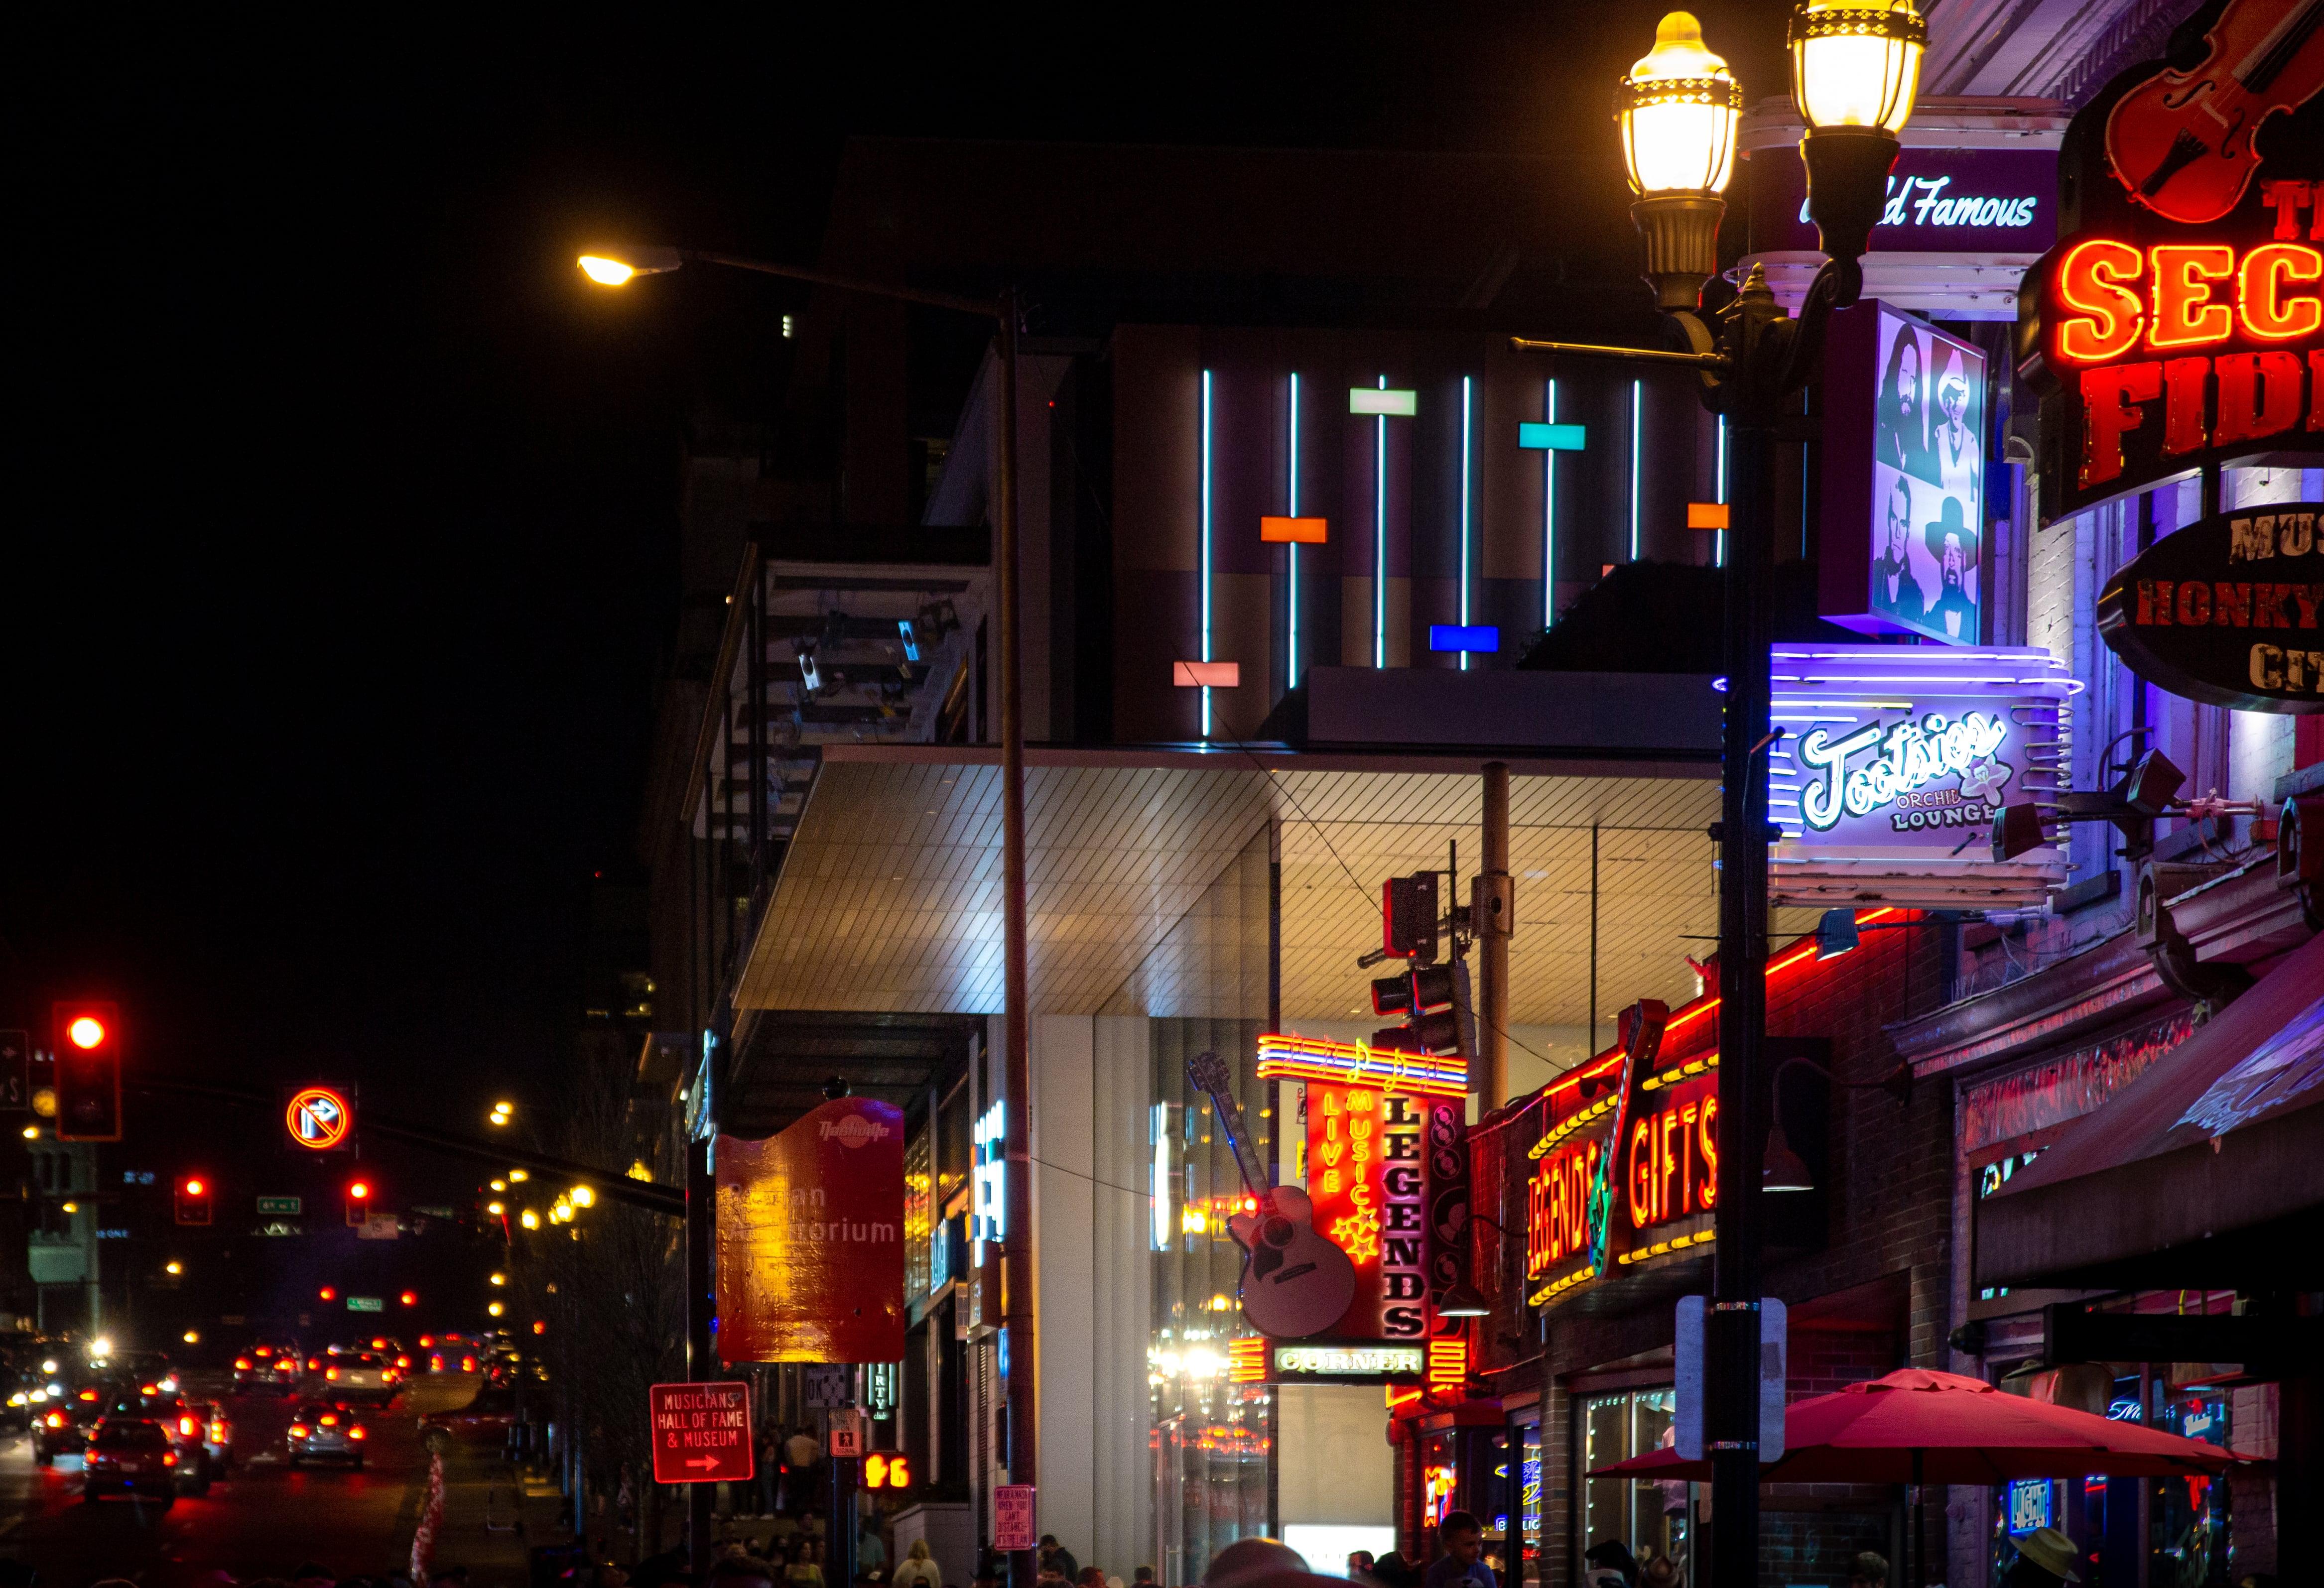 Neon light in Downtown Nashville